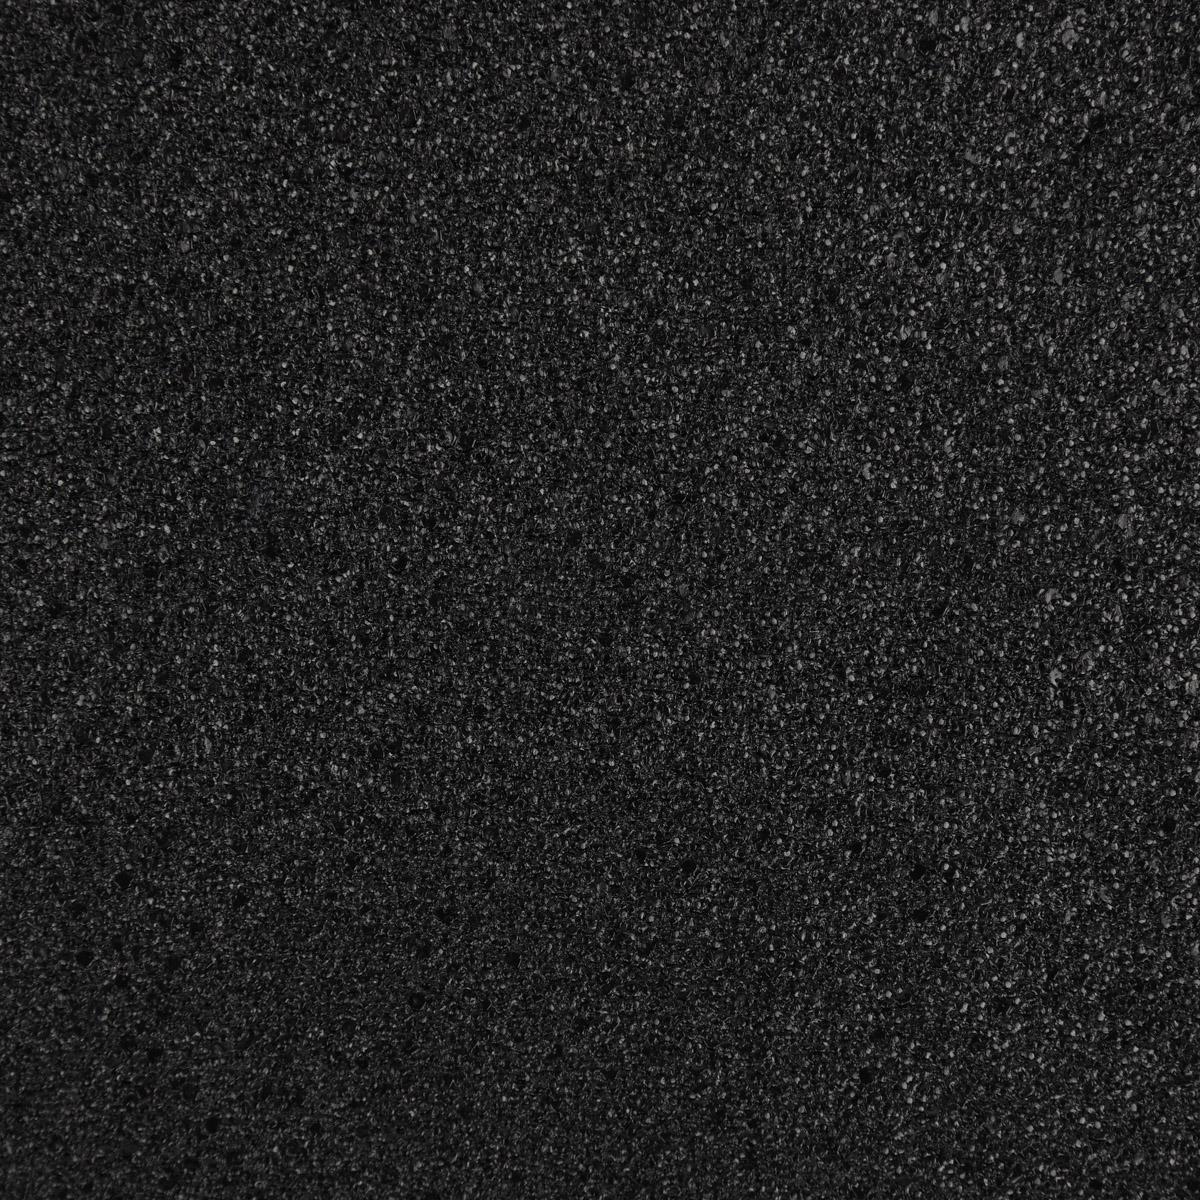 Kunstleder Lederimitat Struktur schwarz Hochglanz 1,4m Breite